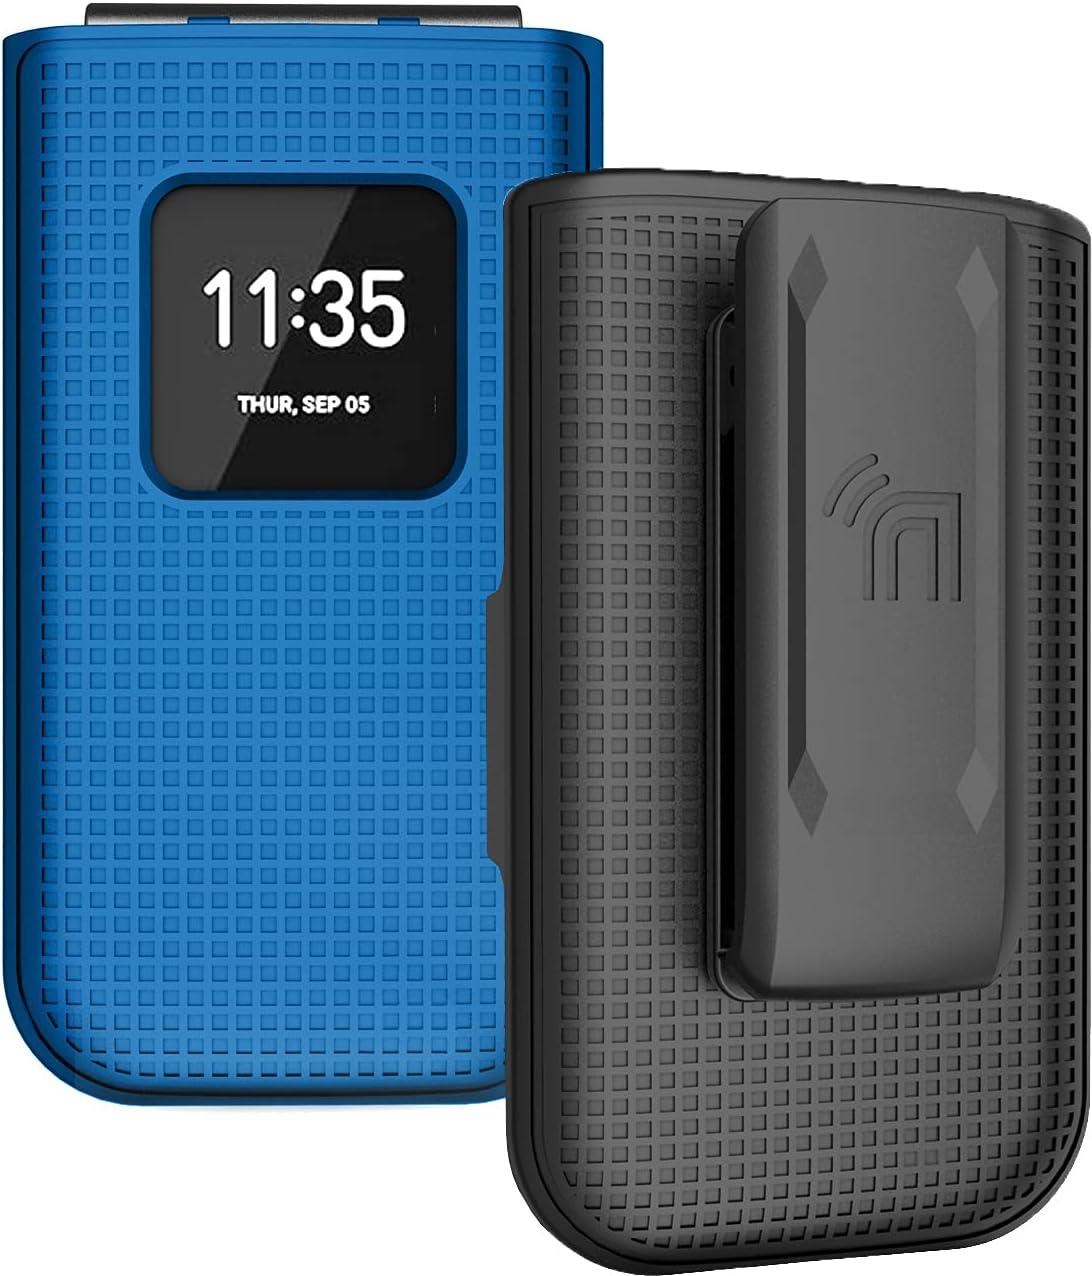 Case with Clip for Nokia 2720 V Flip Phone, Nakedcellphone [Cobalt Blue] Snap-On Hard Shell Cover with [Rotating/Ratchet] Belt Hip Holster Holder for Verizon TA-1295